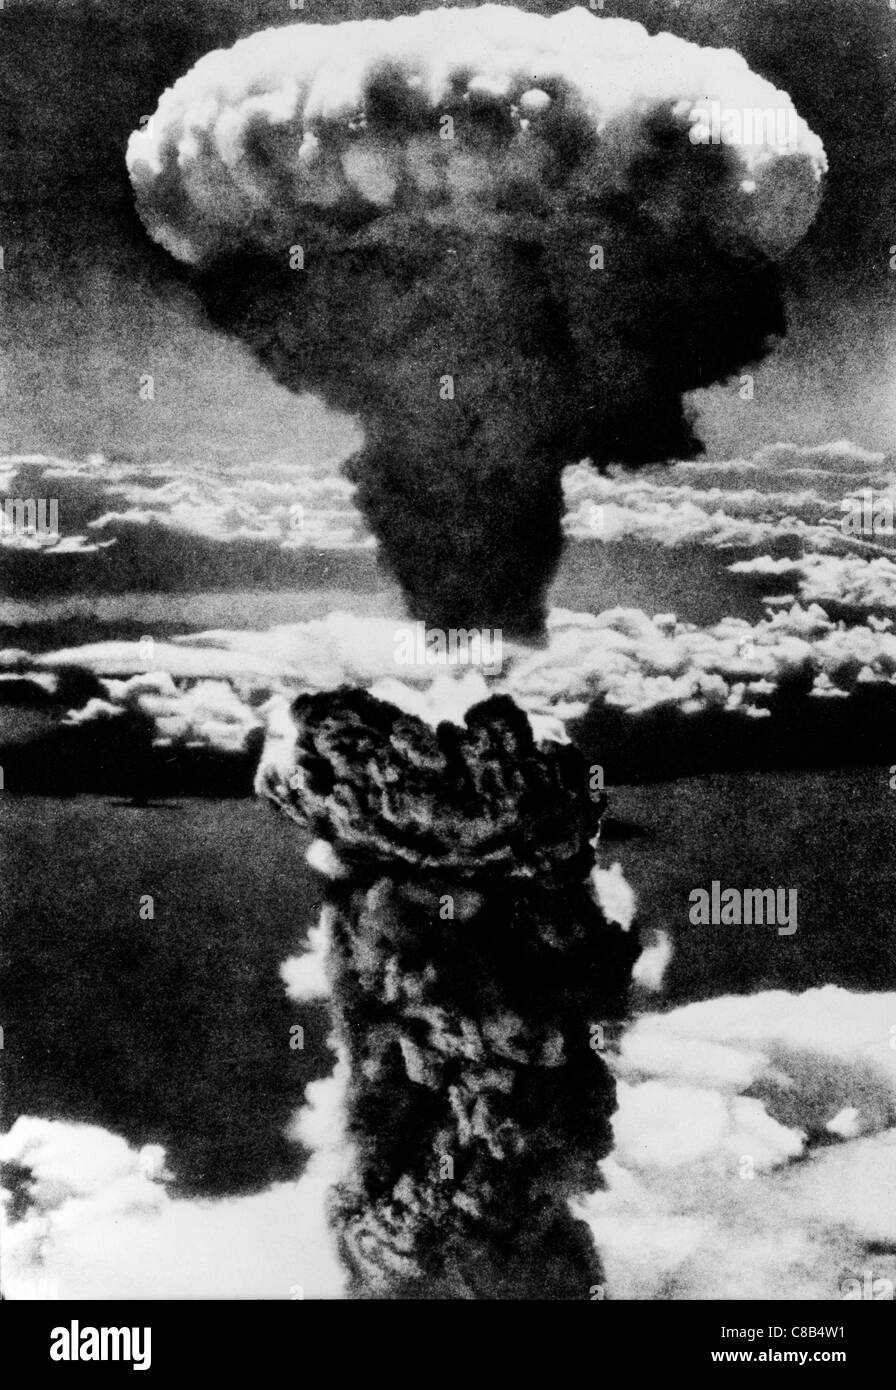 Esplosione atomica a Hiroshima,1945 Foto Stock